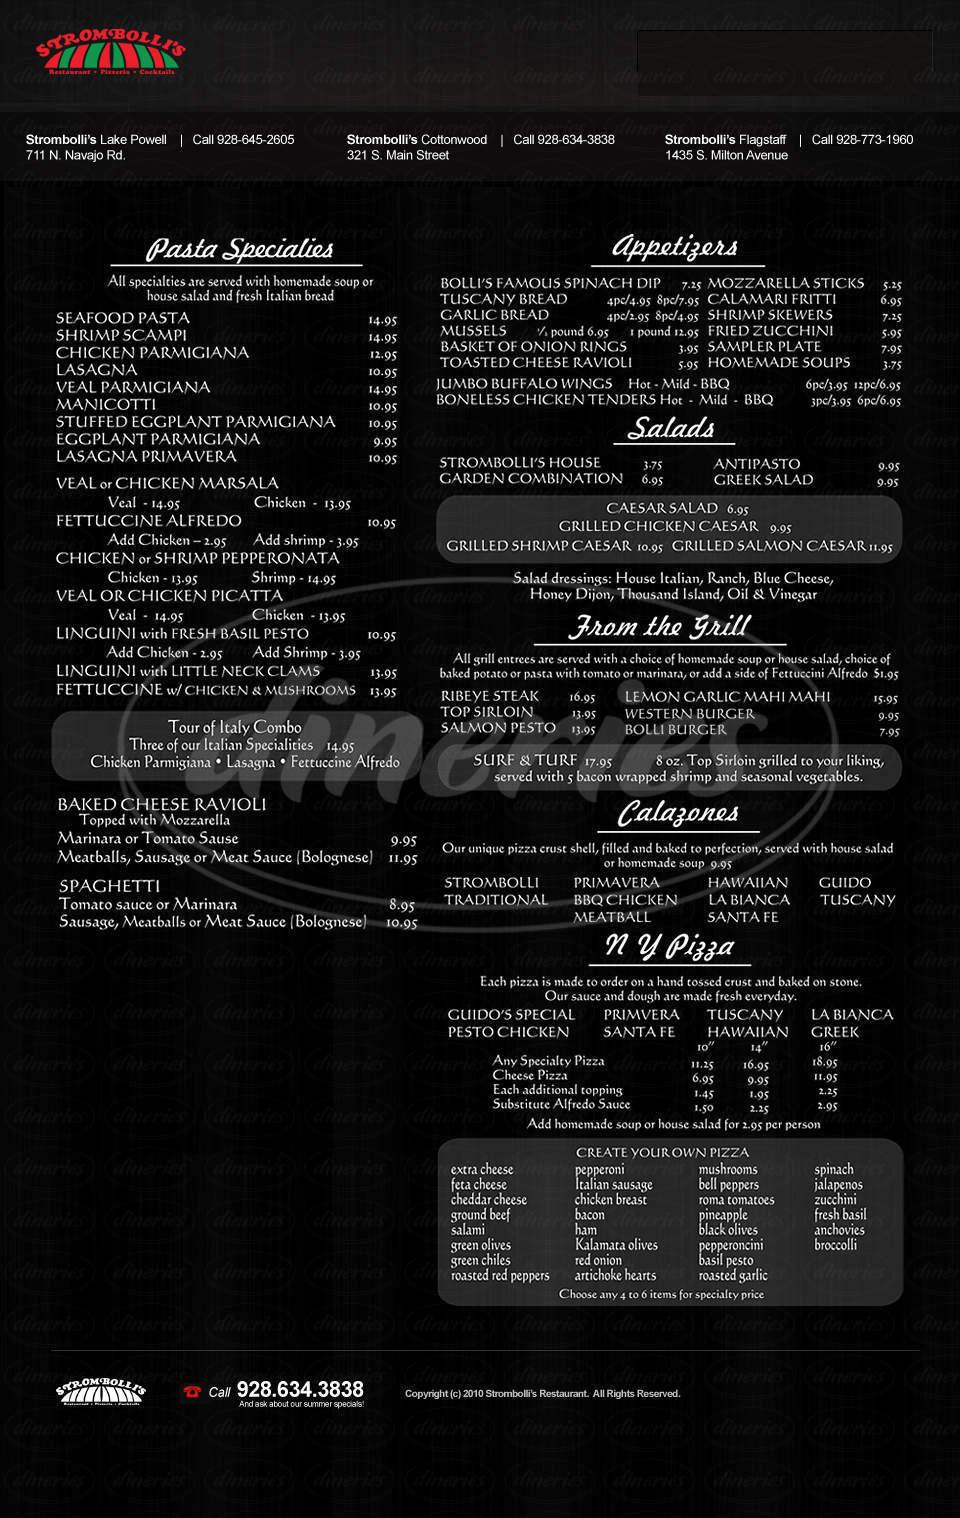 menu for Strombolli's